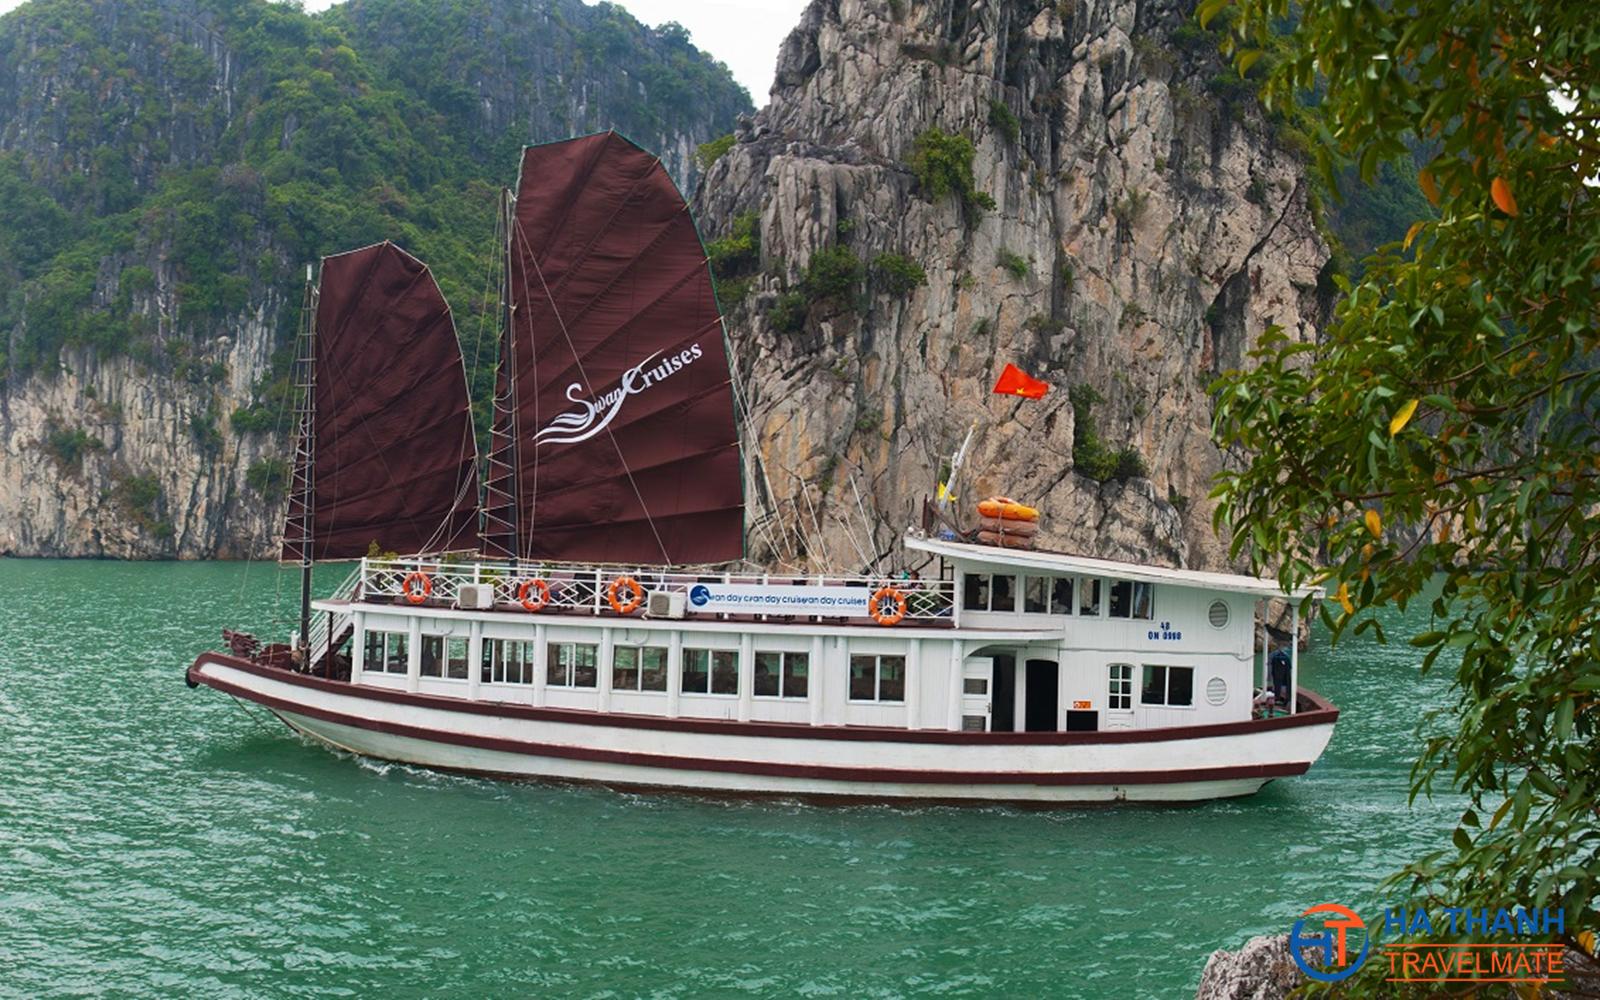 Swan Day Cruise